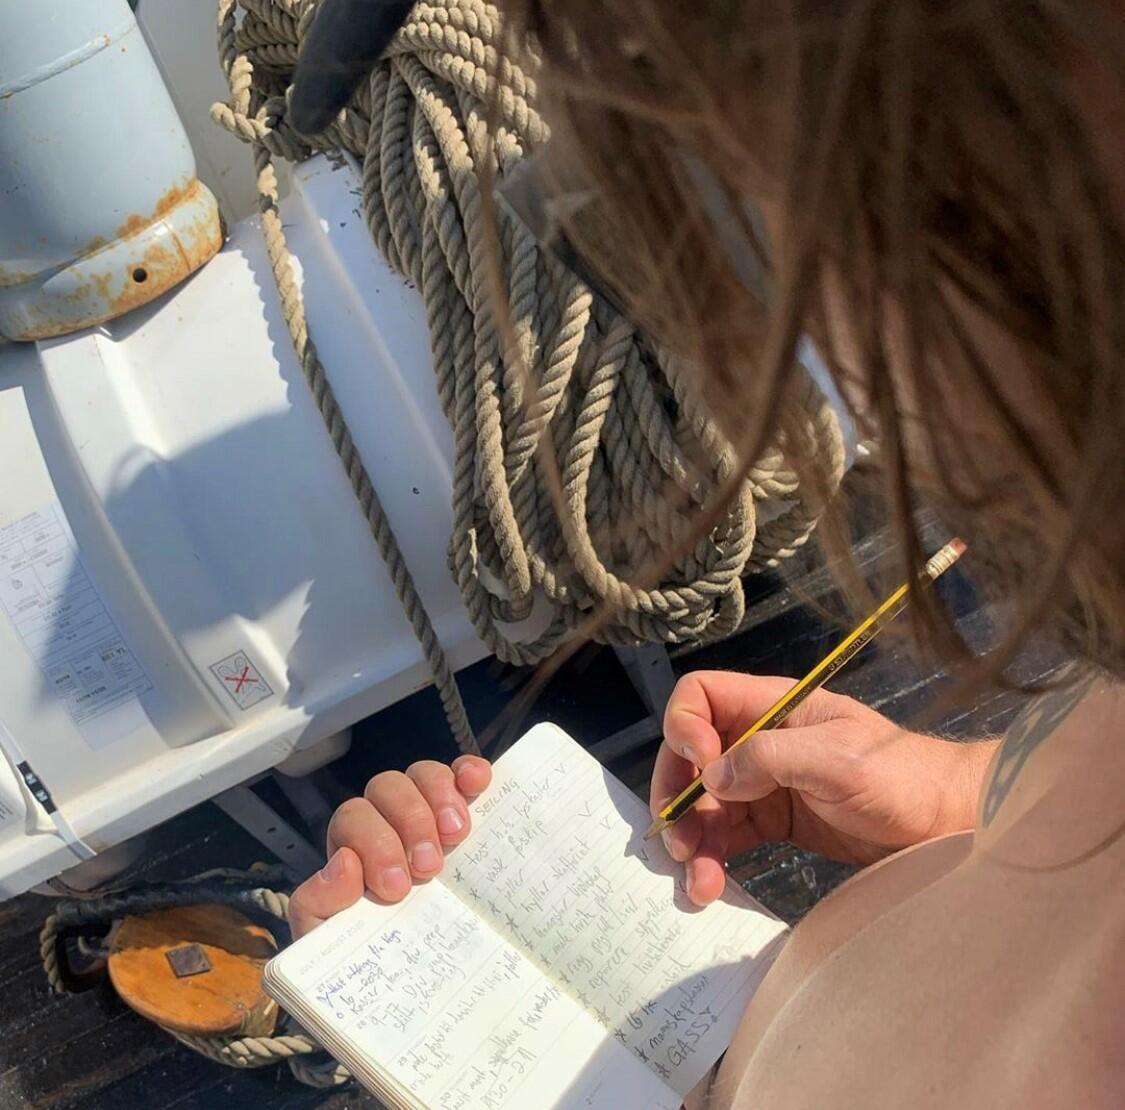 mann som skriver notater i en bok (Foto/Photo)